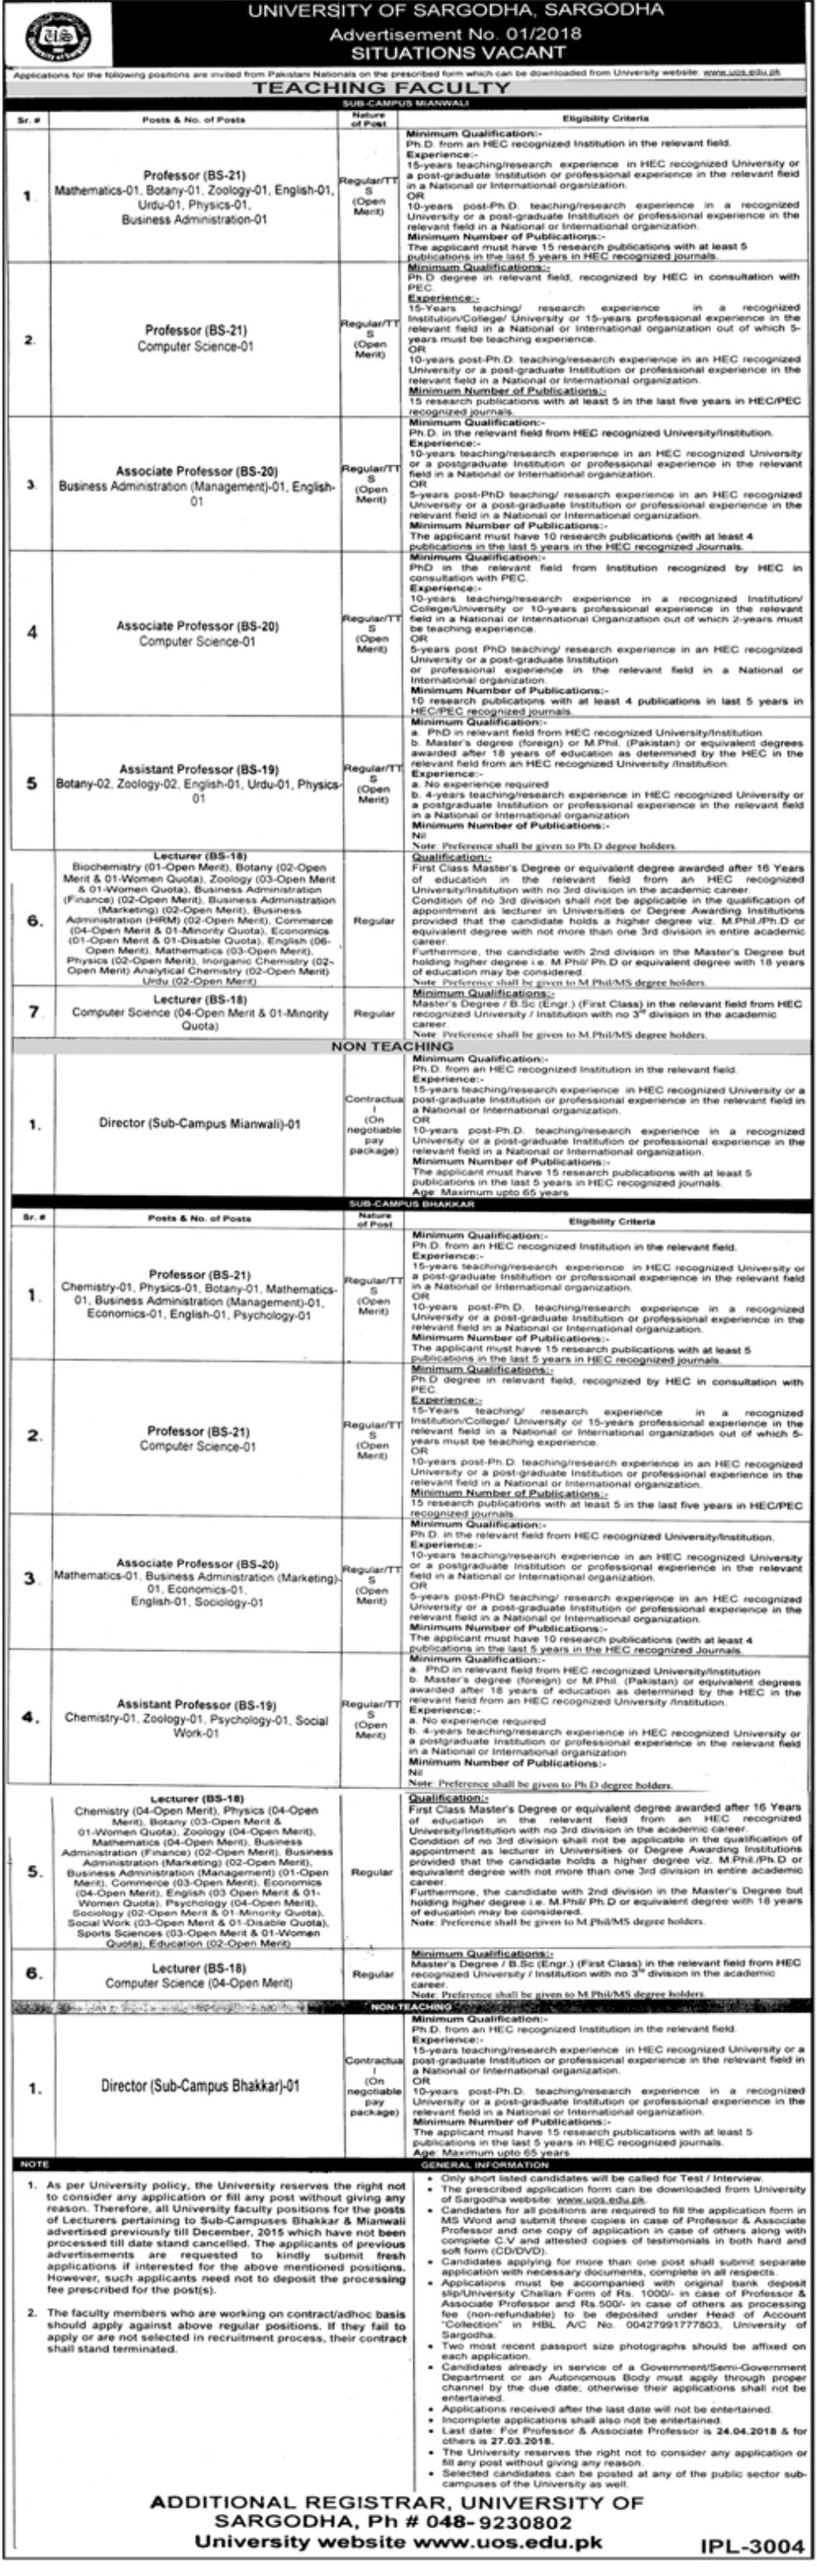 University of Sargodha New Jobs 09 March 2018 Daily Jang Newspaper